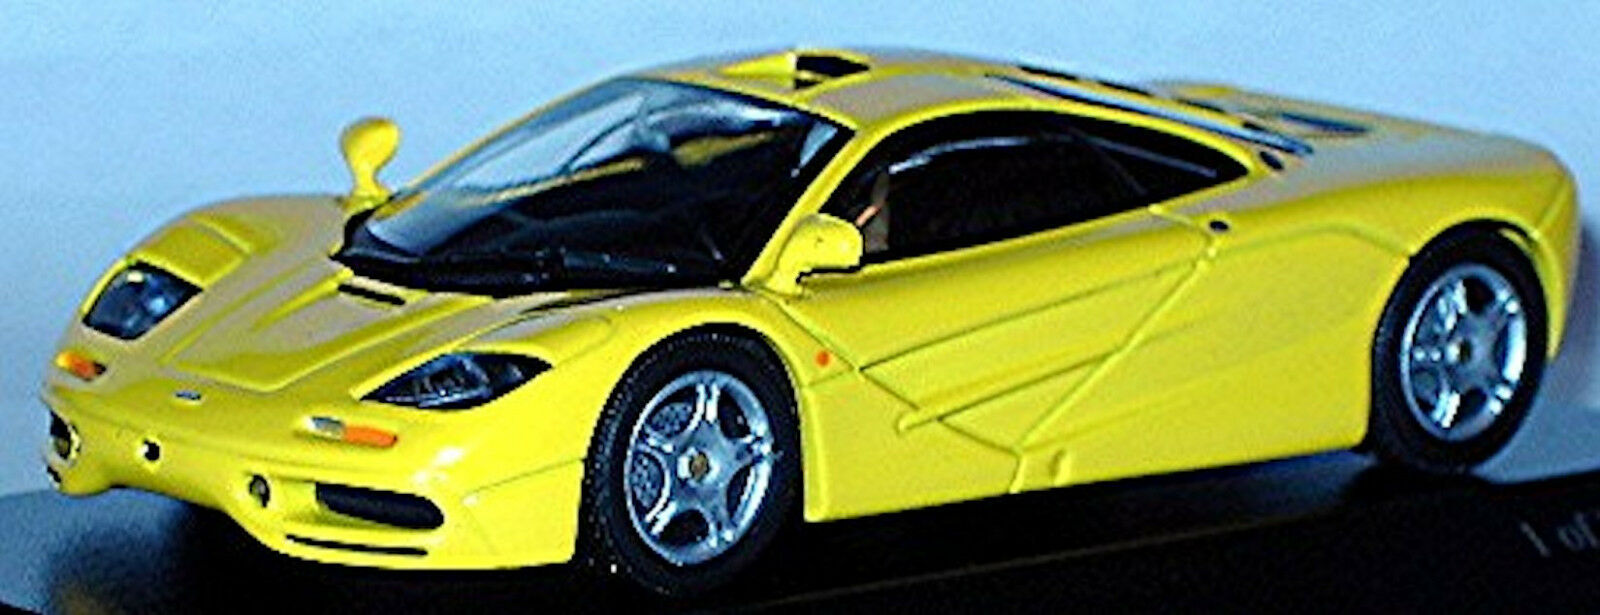 McLaren f1 roadcar 1993-97 jaune jaune 1 43 MINICHAMPS